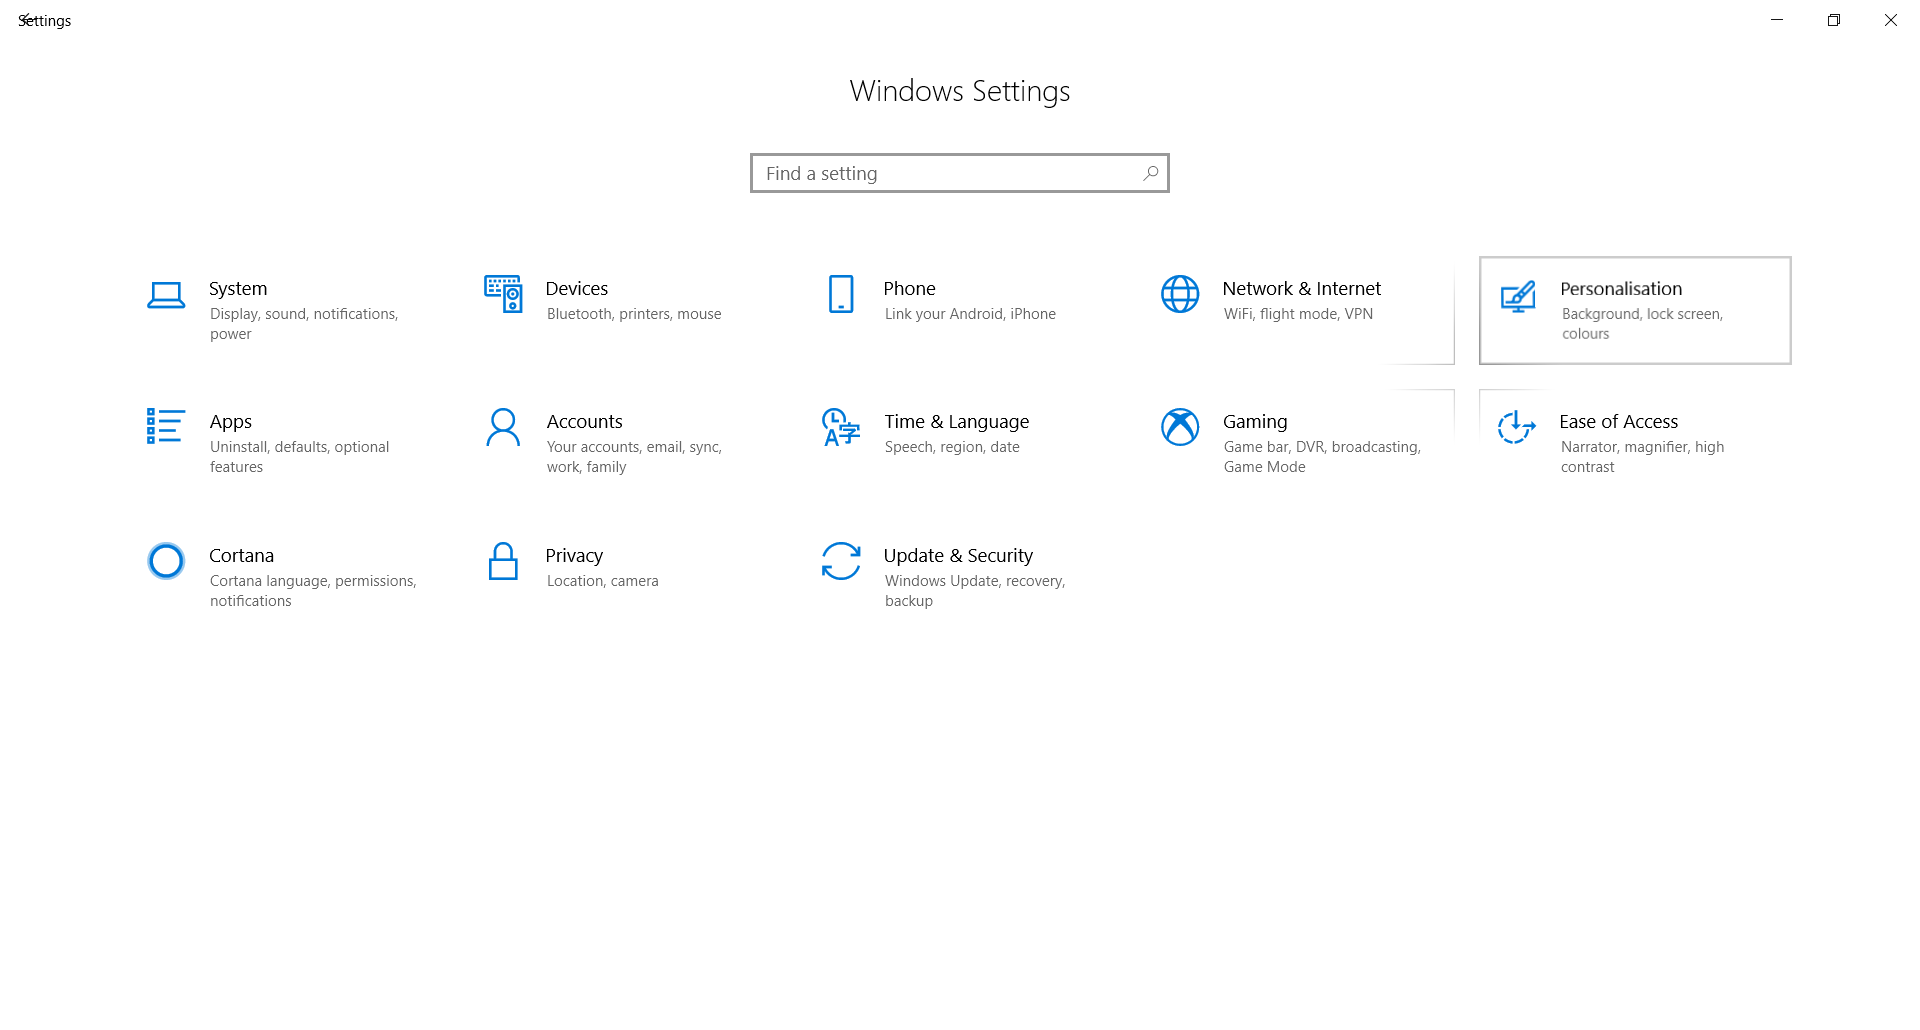 Windows 10 Desktop personalisation not opening 719fb4d6-91ae-4acc-afc0-f216f43b5588?upload=true.png